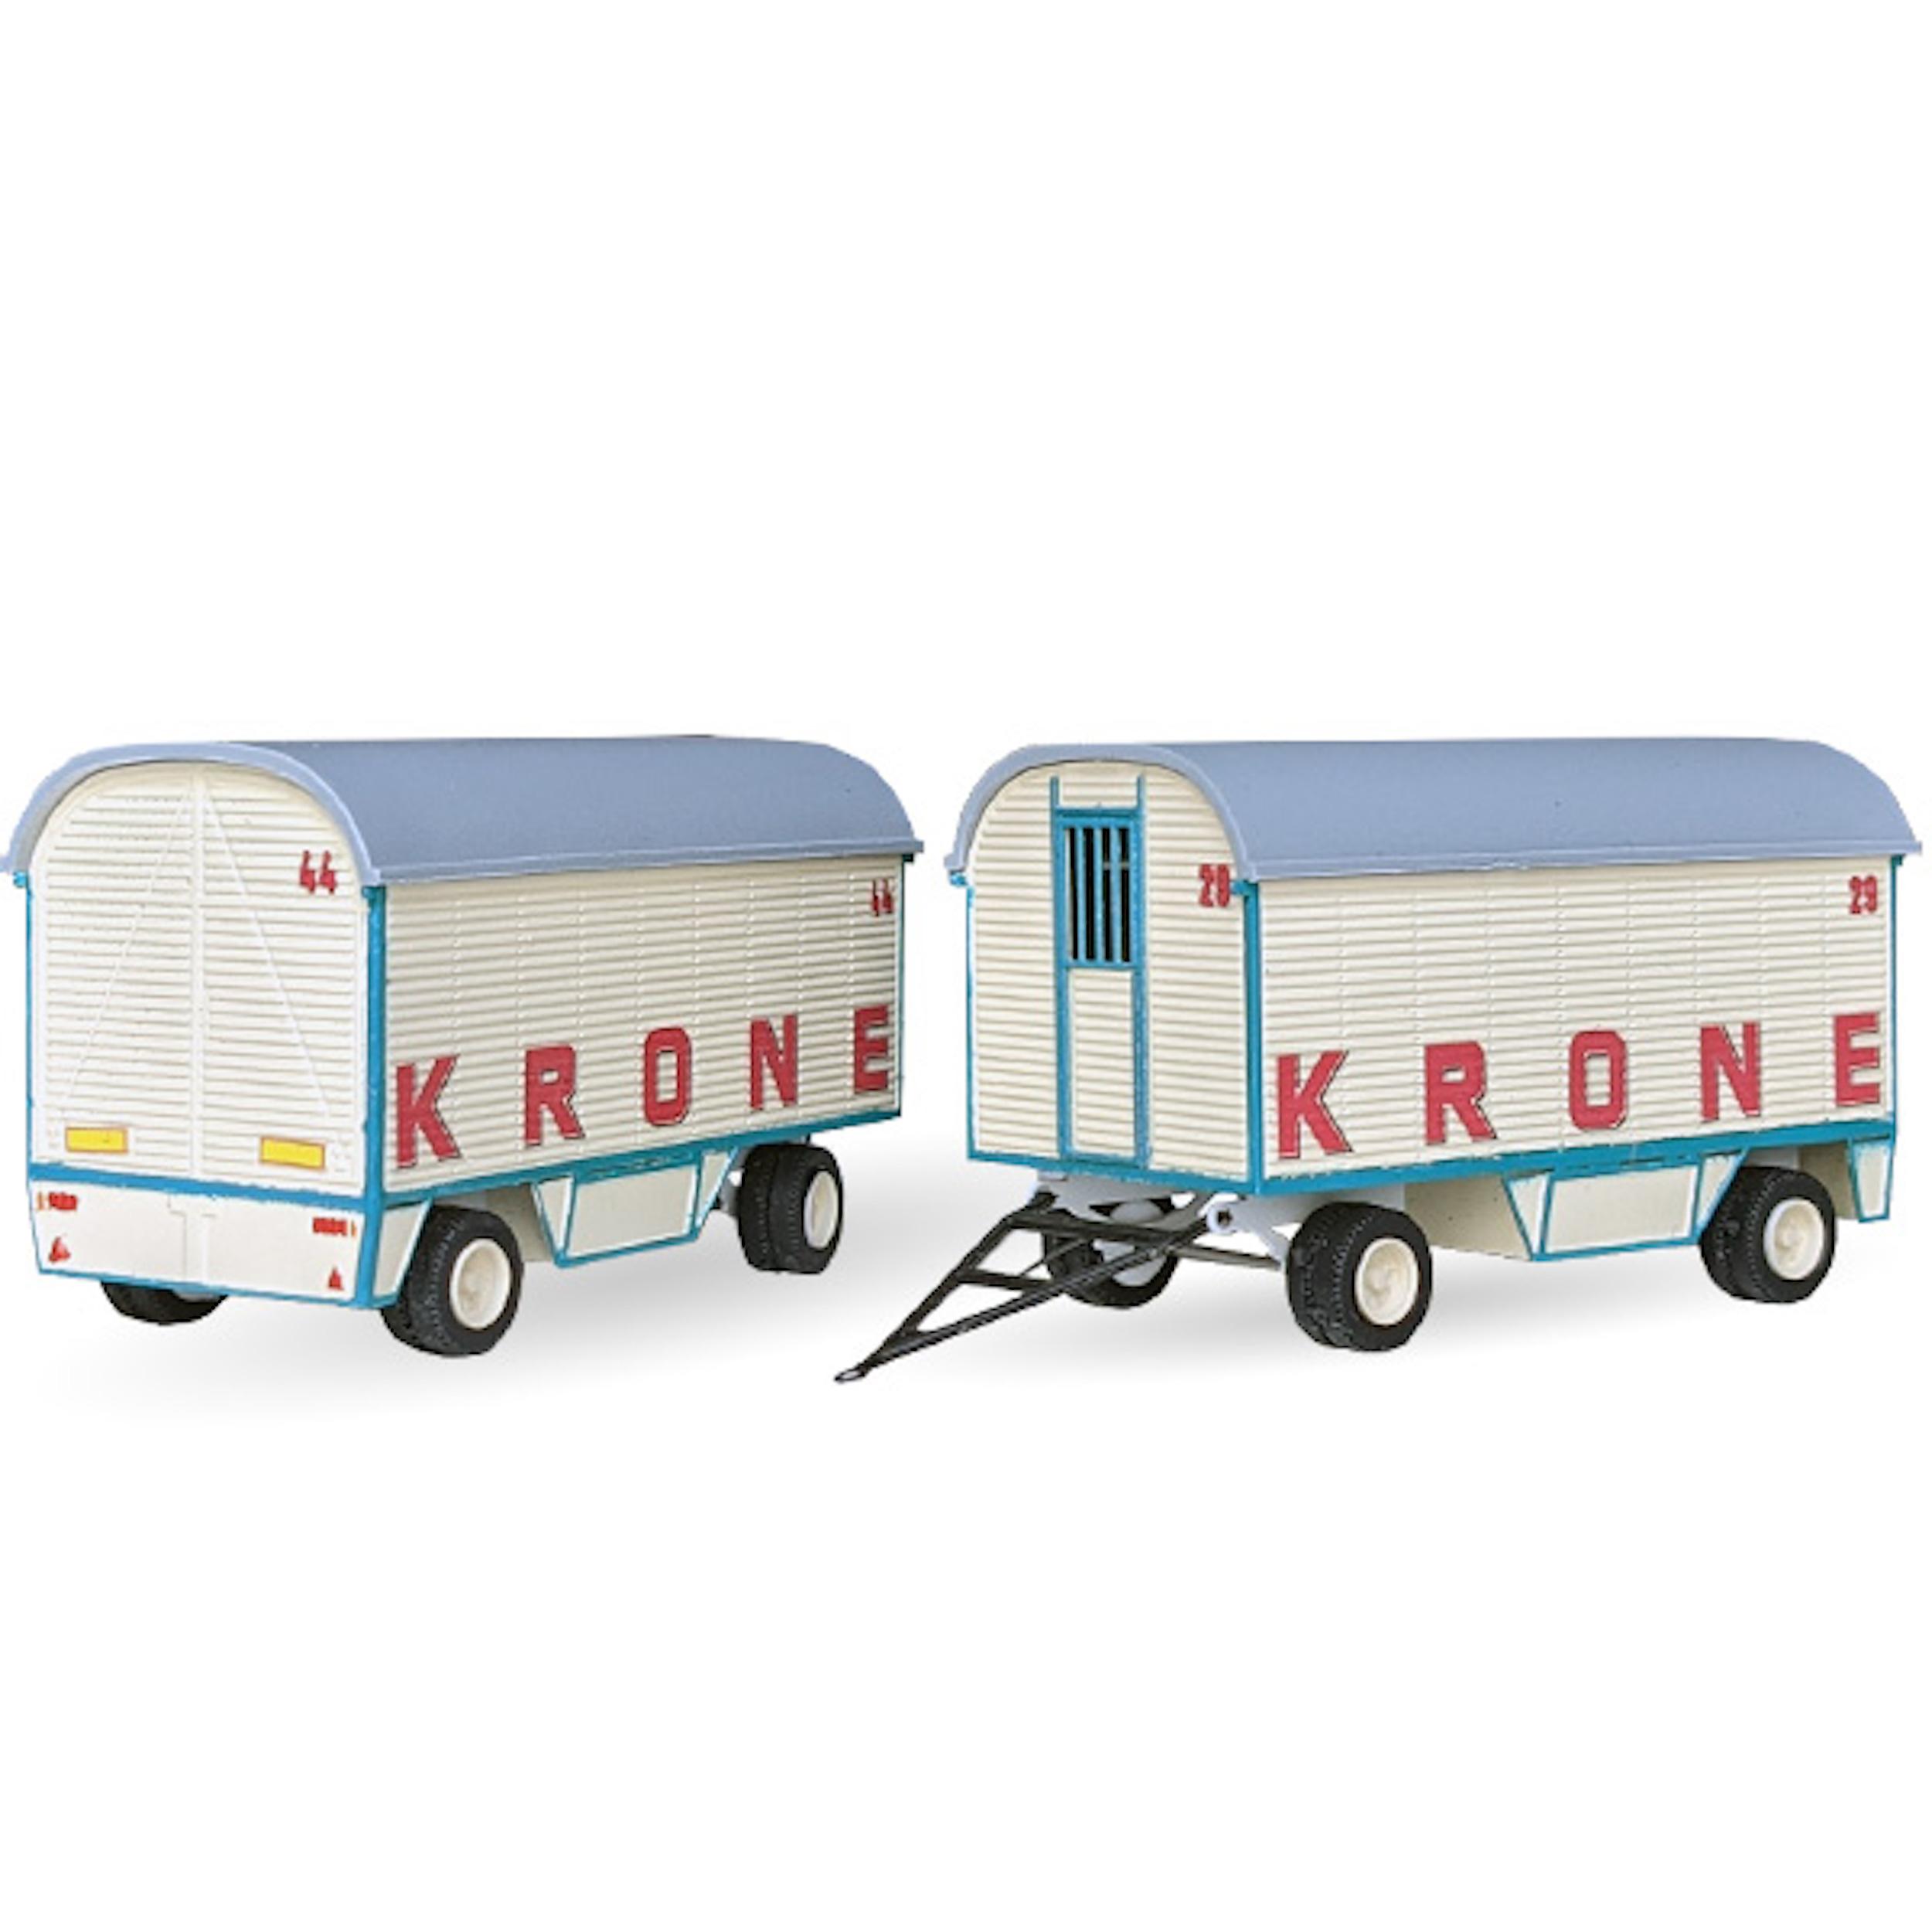 Circus Krone Gradinwagen - 2er Set - Bausatz 1:87